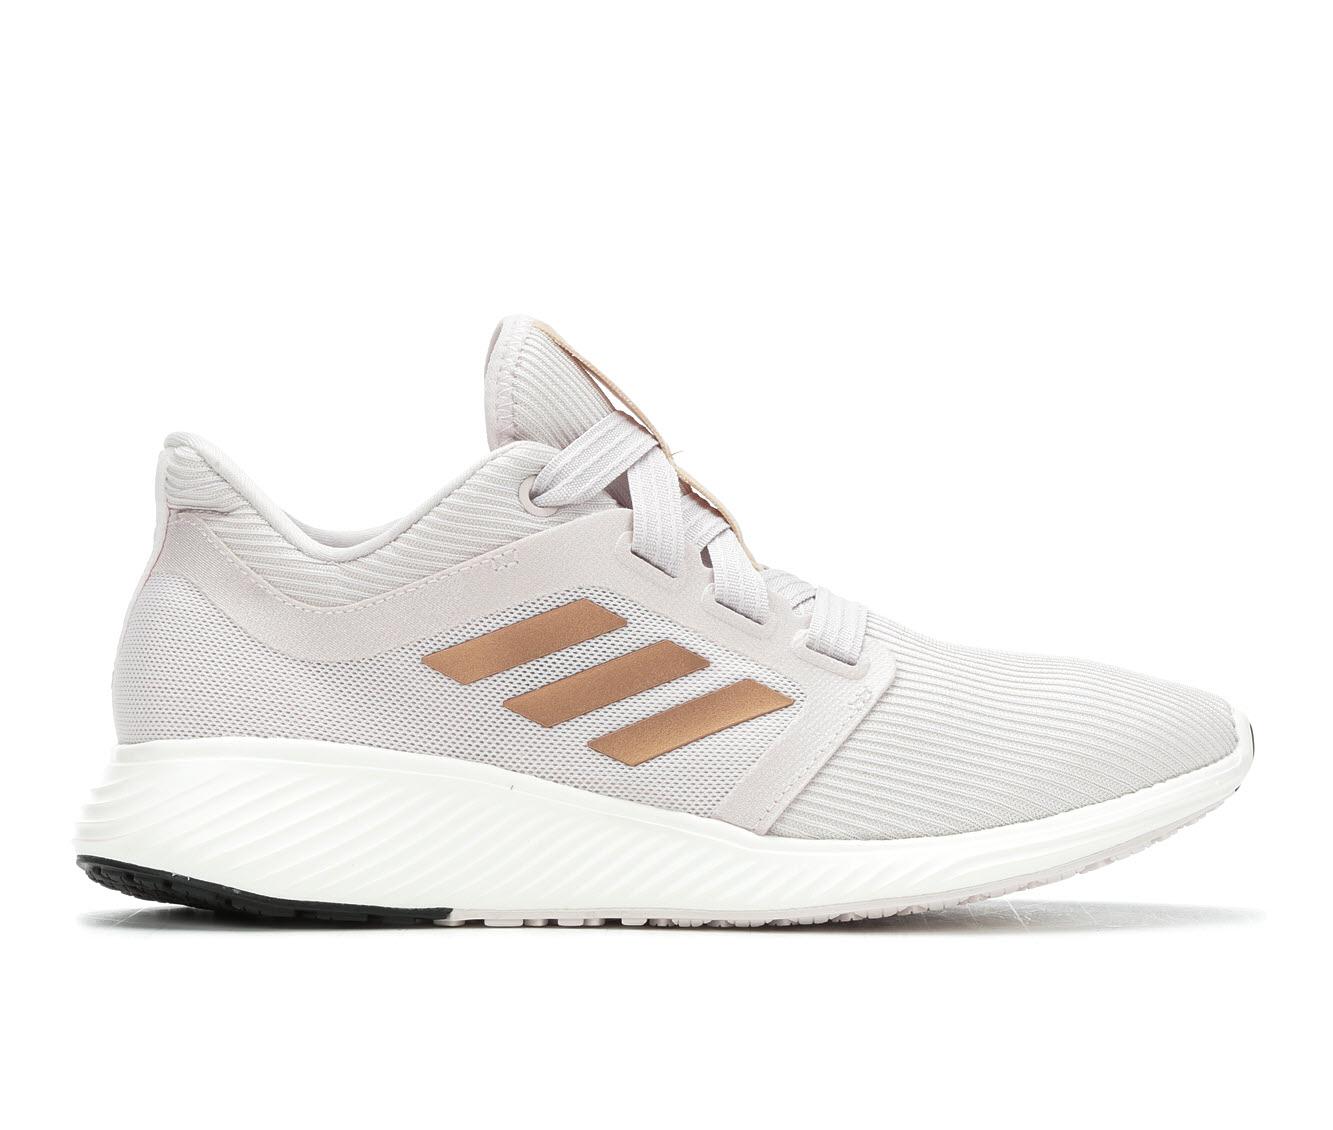 Adidas Edge Lux 3 Women's Athletic Shoe (Beige)